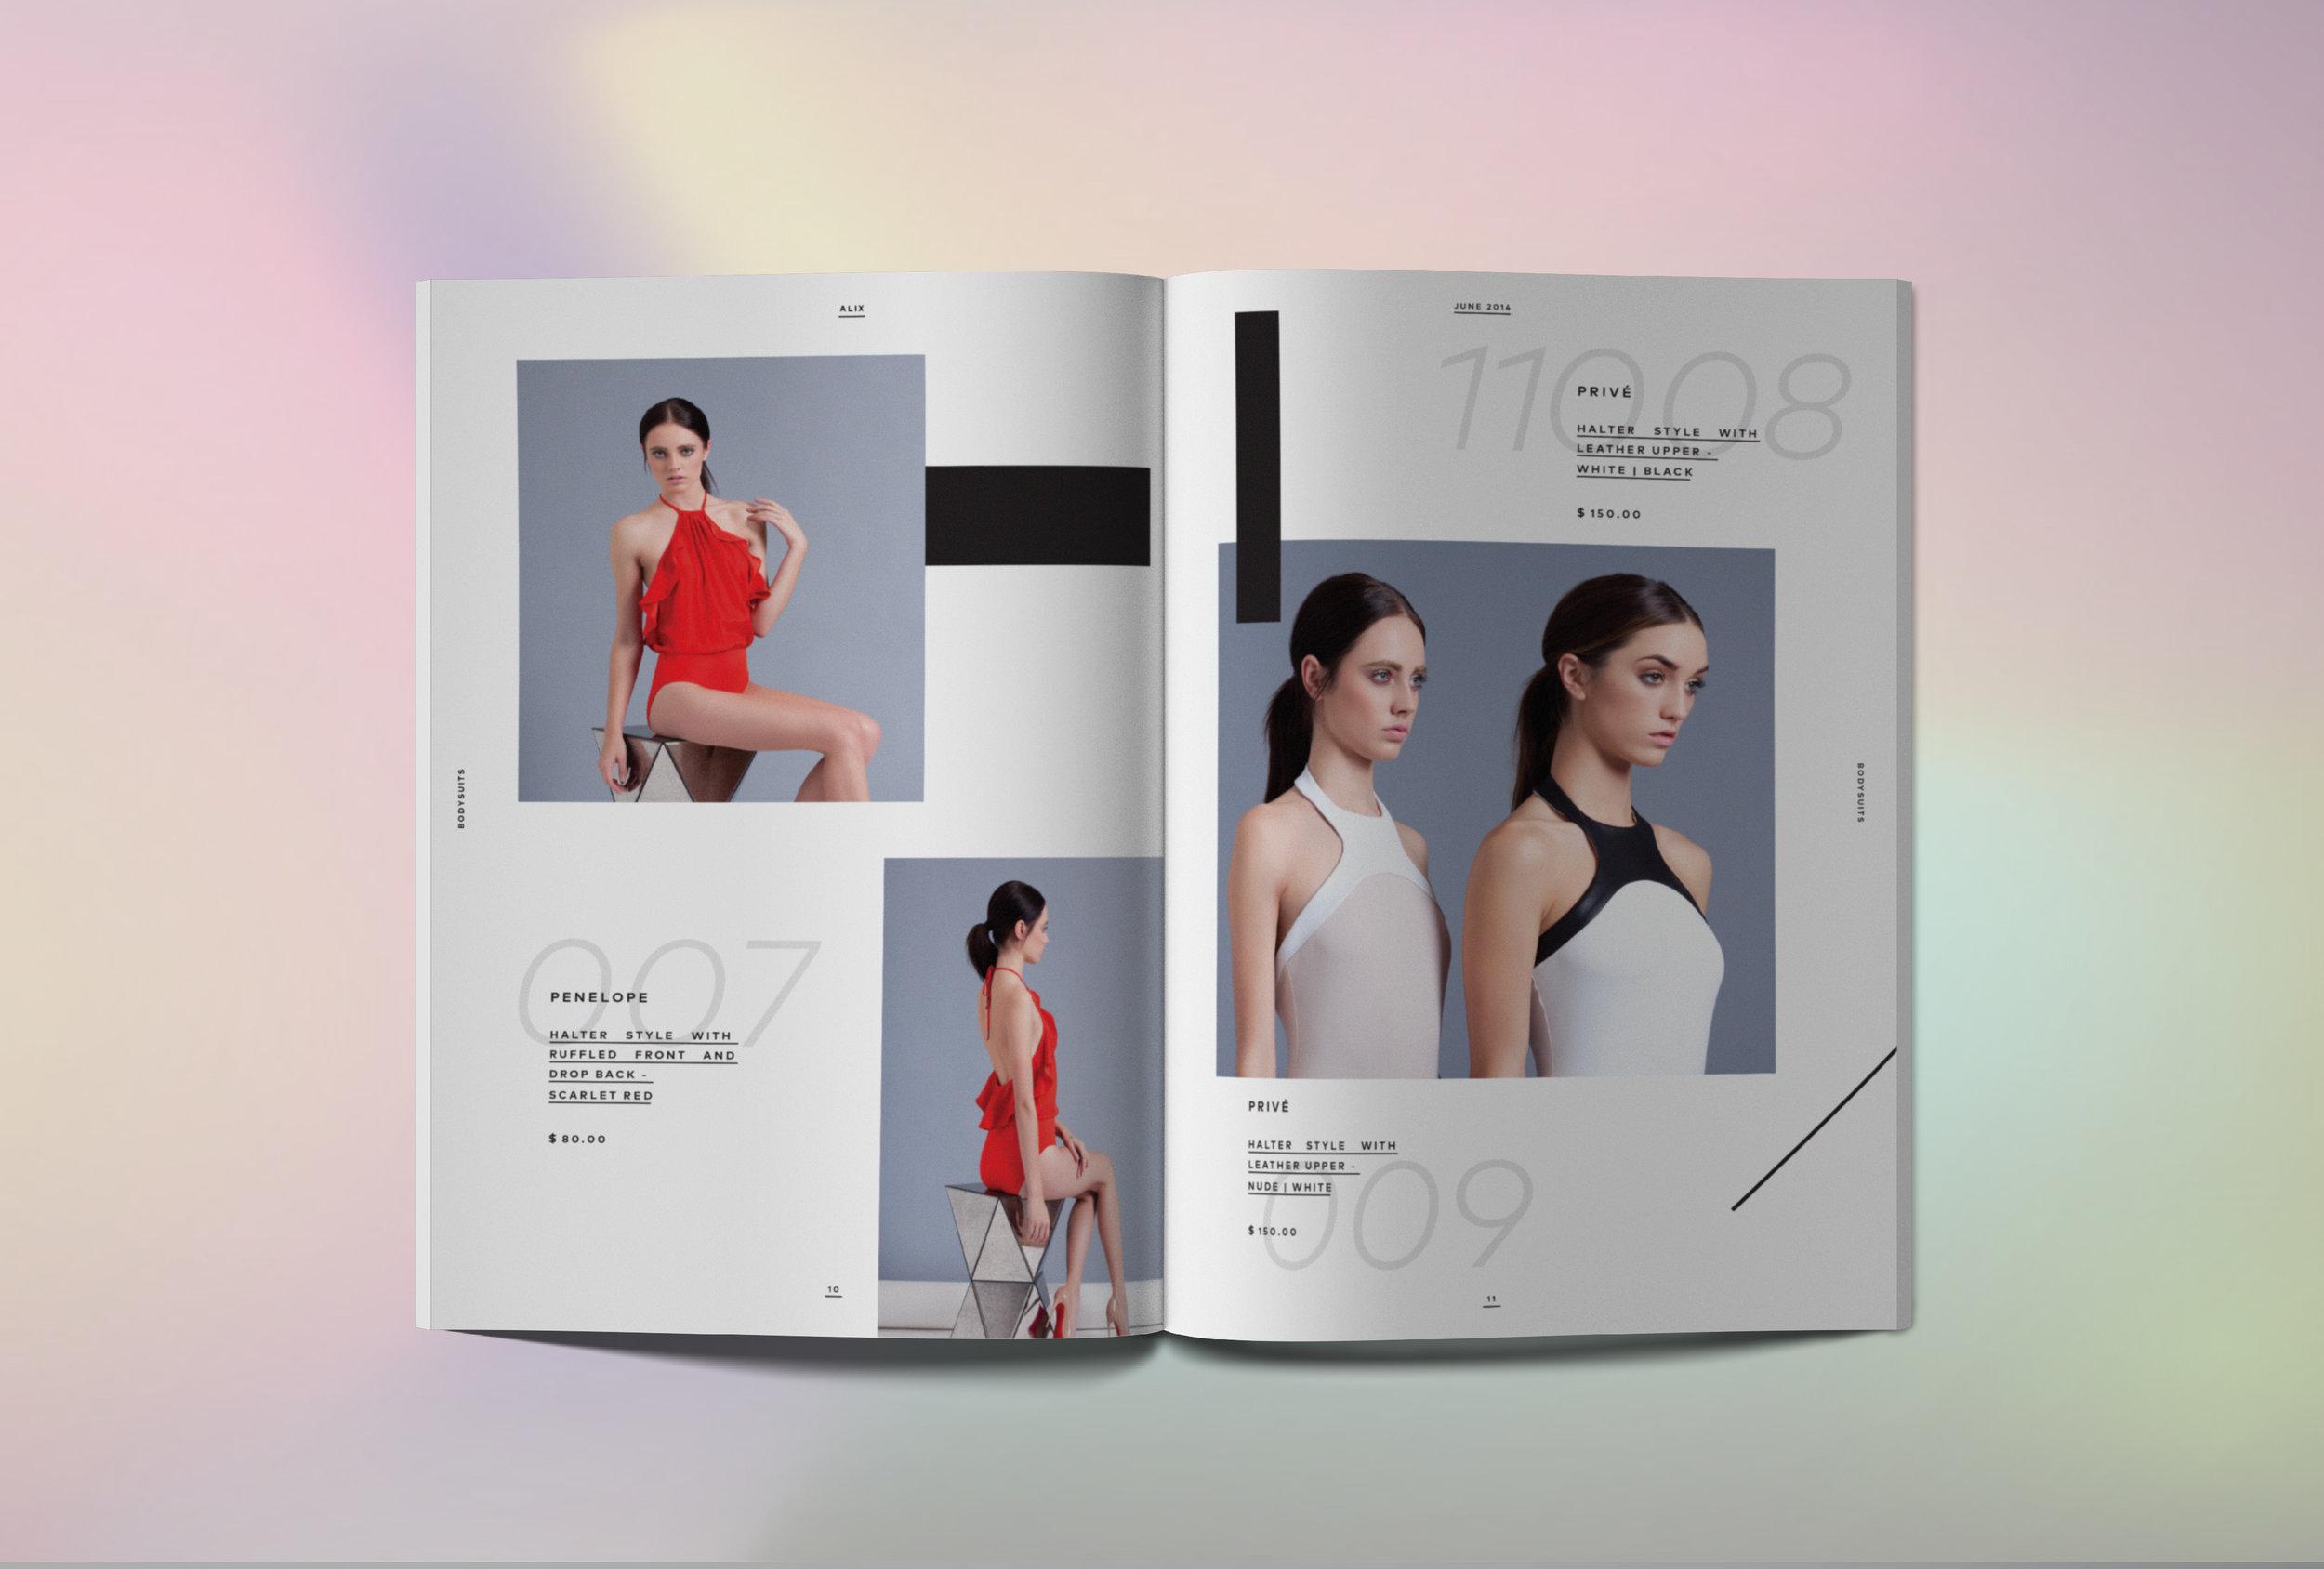 Sarah-Rose-Andrew-ALIX-LOOKBOOK-PAGES-3.jpg